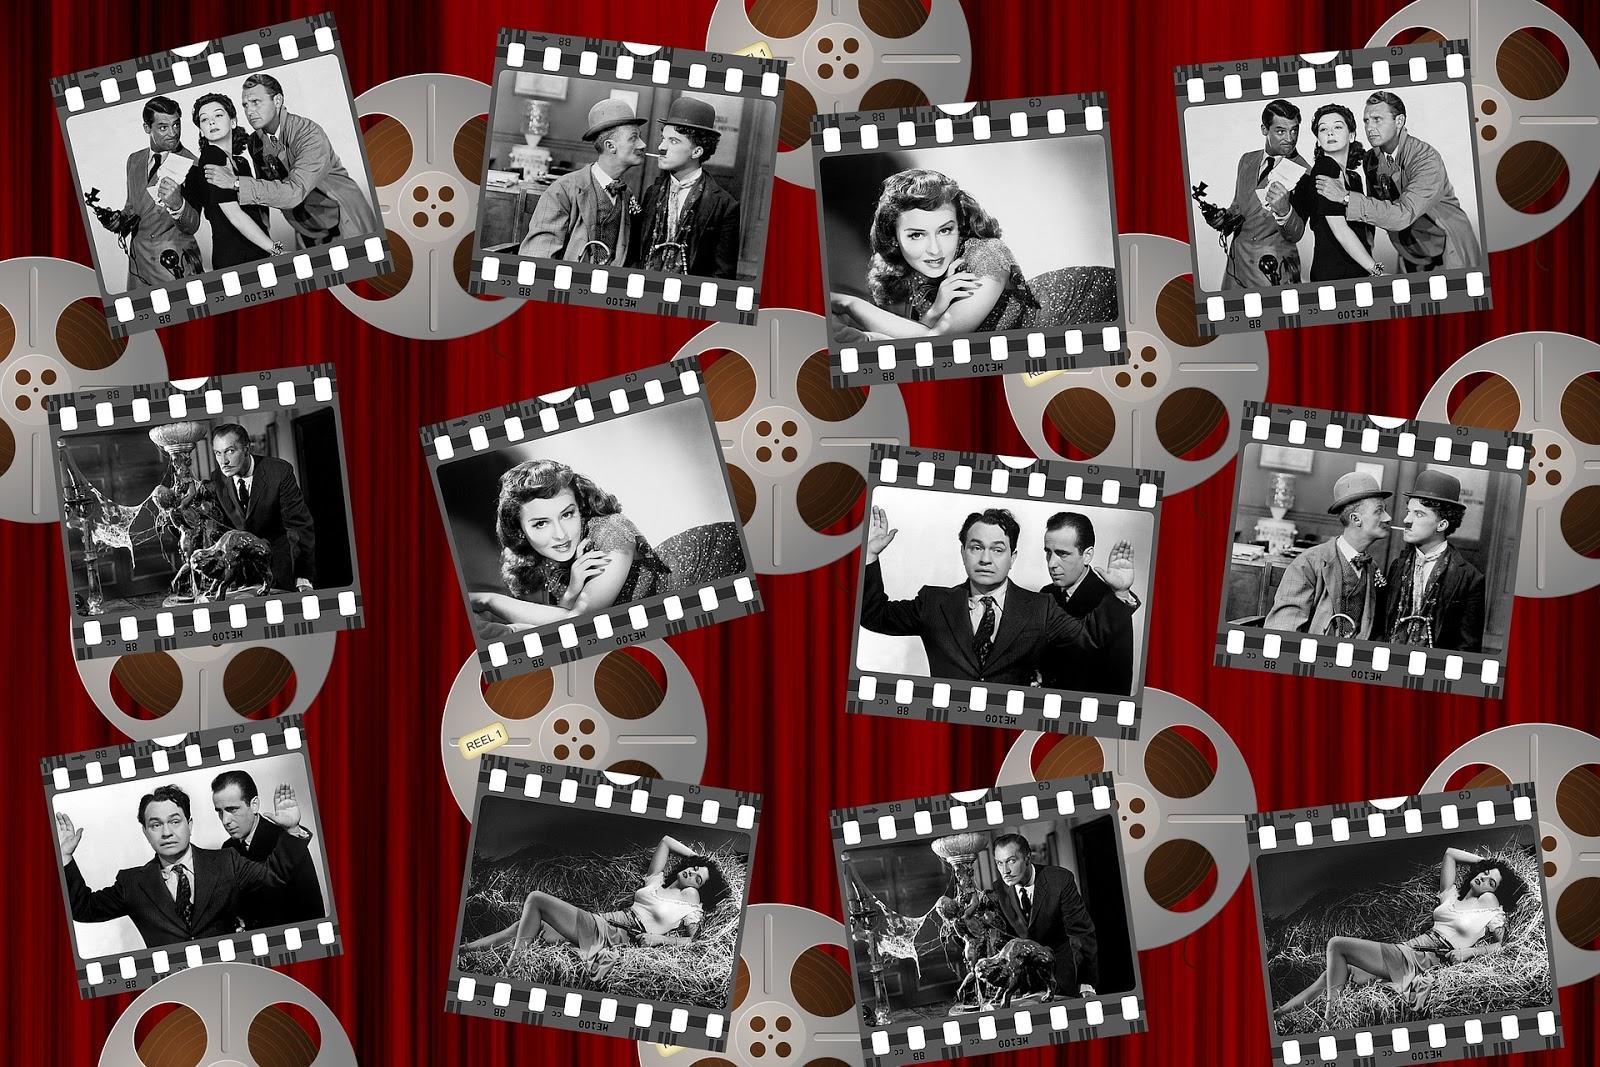 3 Tips to learn Filmmaking without Film school - learn filmmaking - how to learn filmmaking without film school